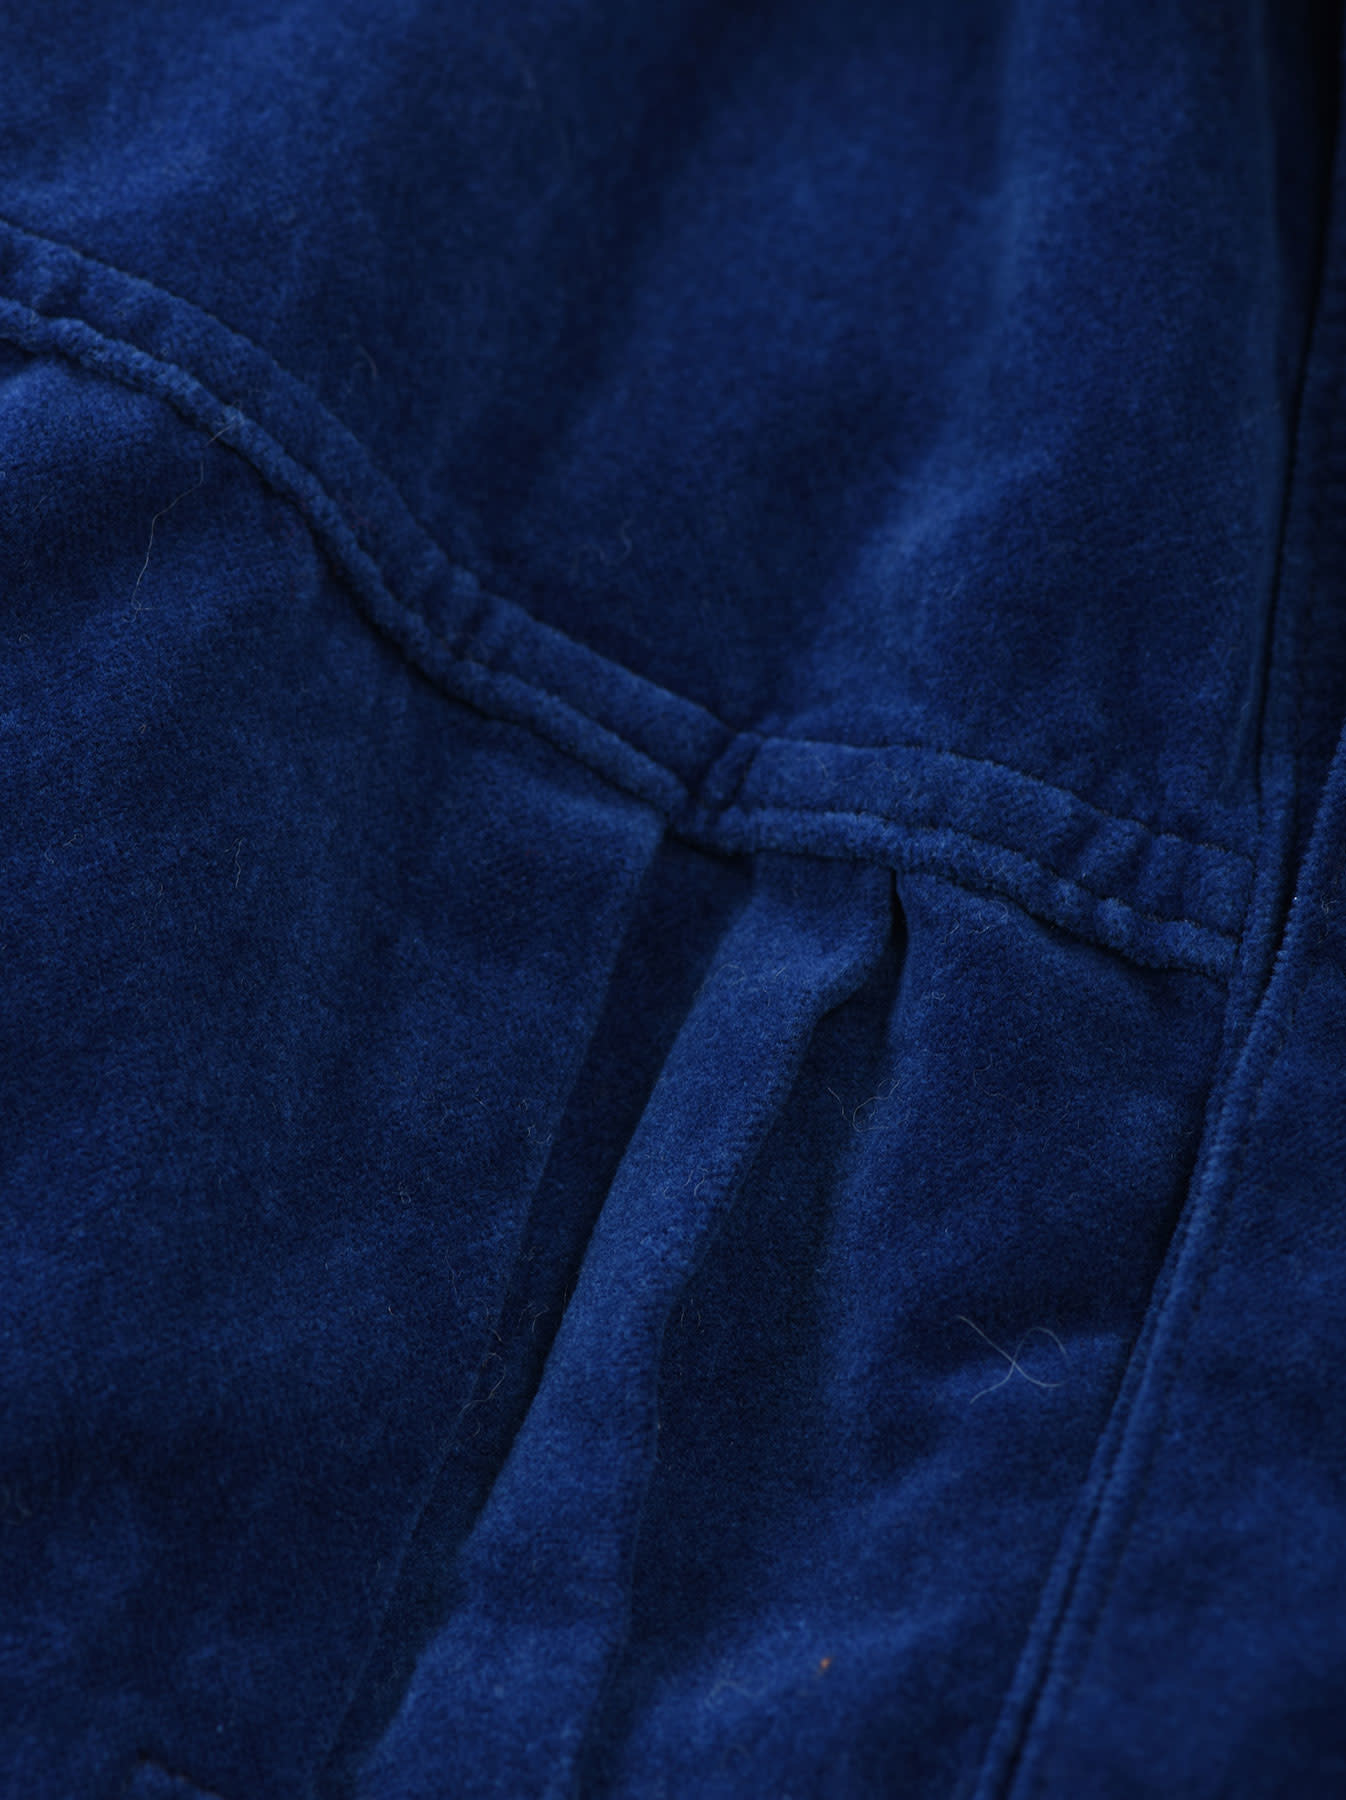 Indigo Velveteen 908 Denim Jacket-8